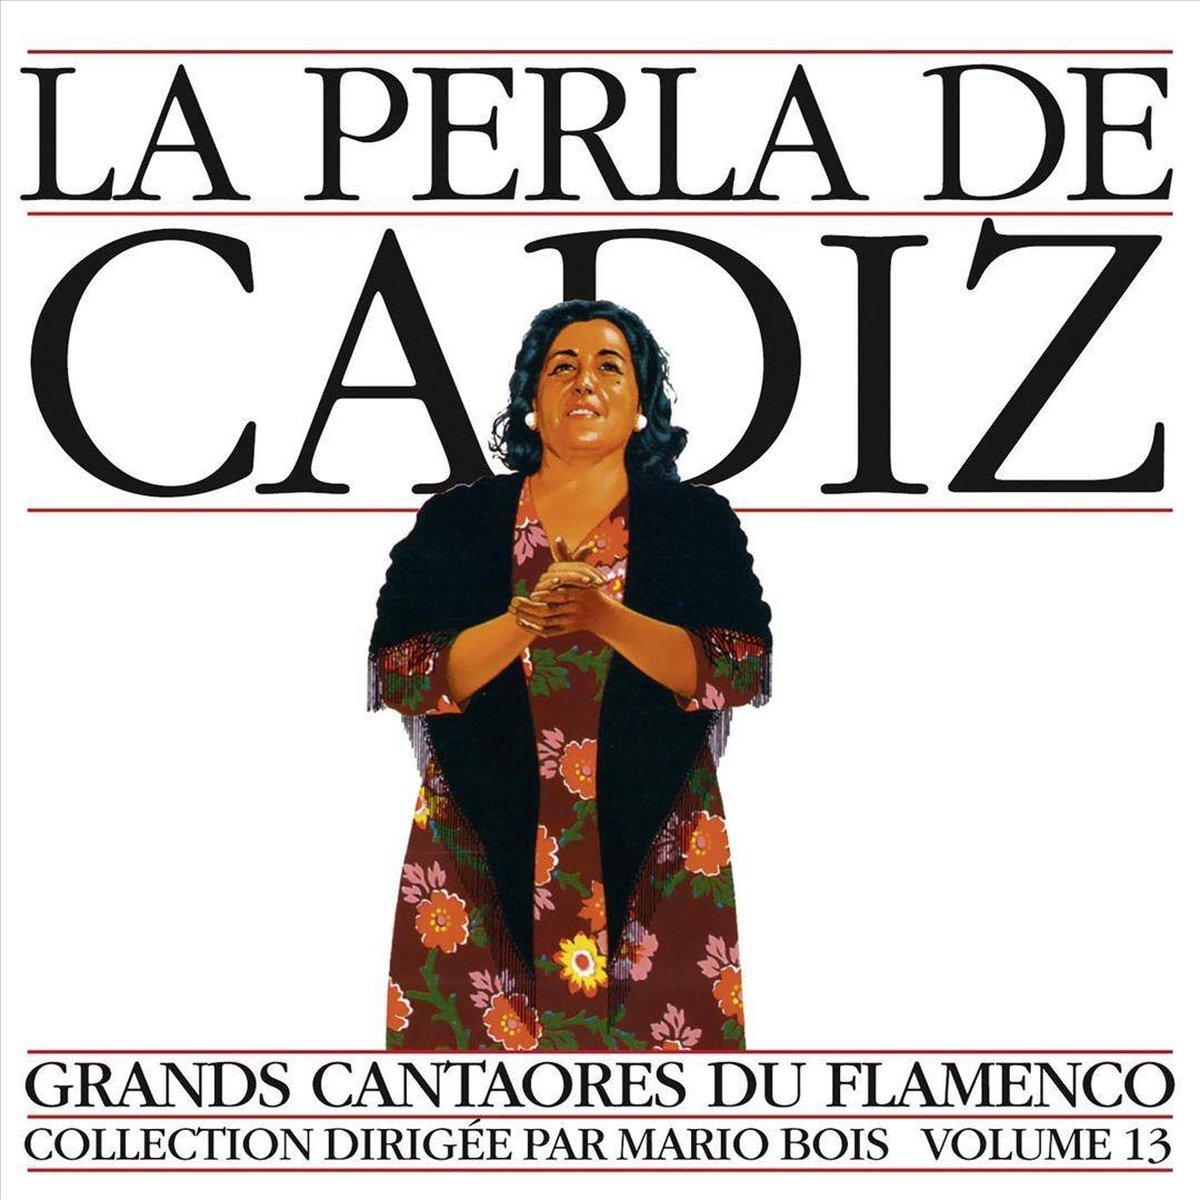 Grands Cantaores Du Flamenco Collection Dirigee Par Mario Bois Vol. 13 - Perla de Cadiz